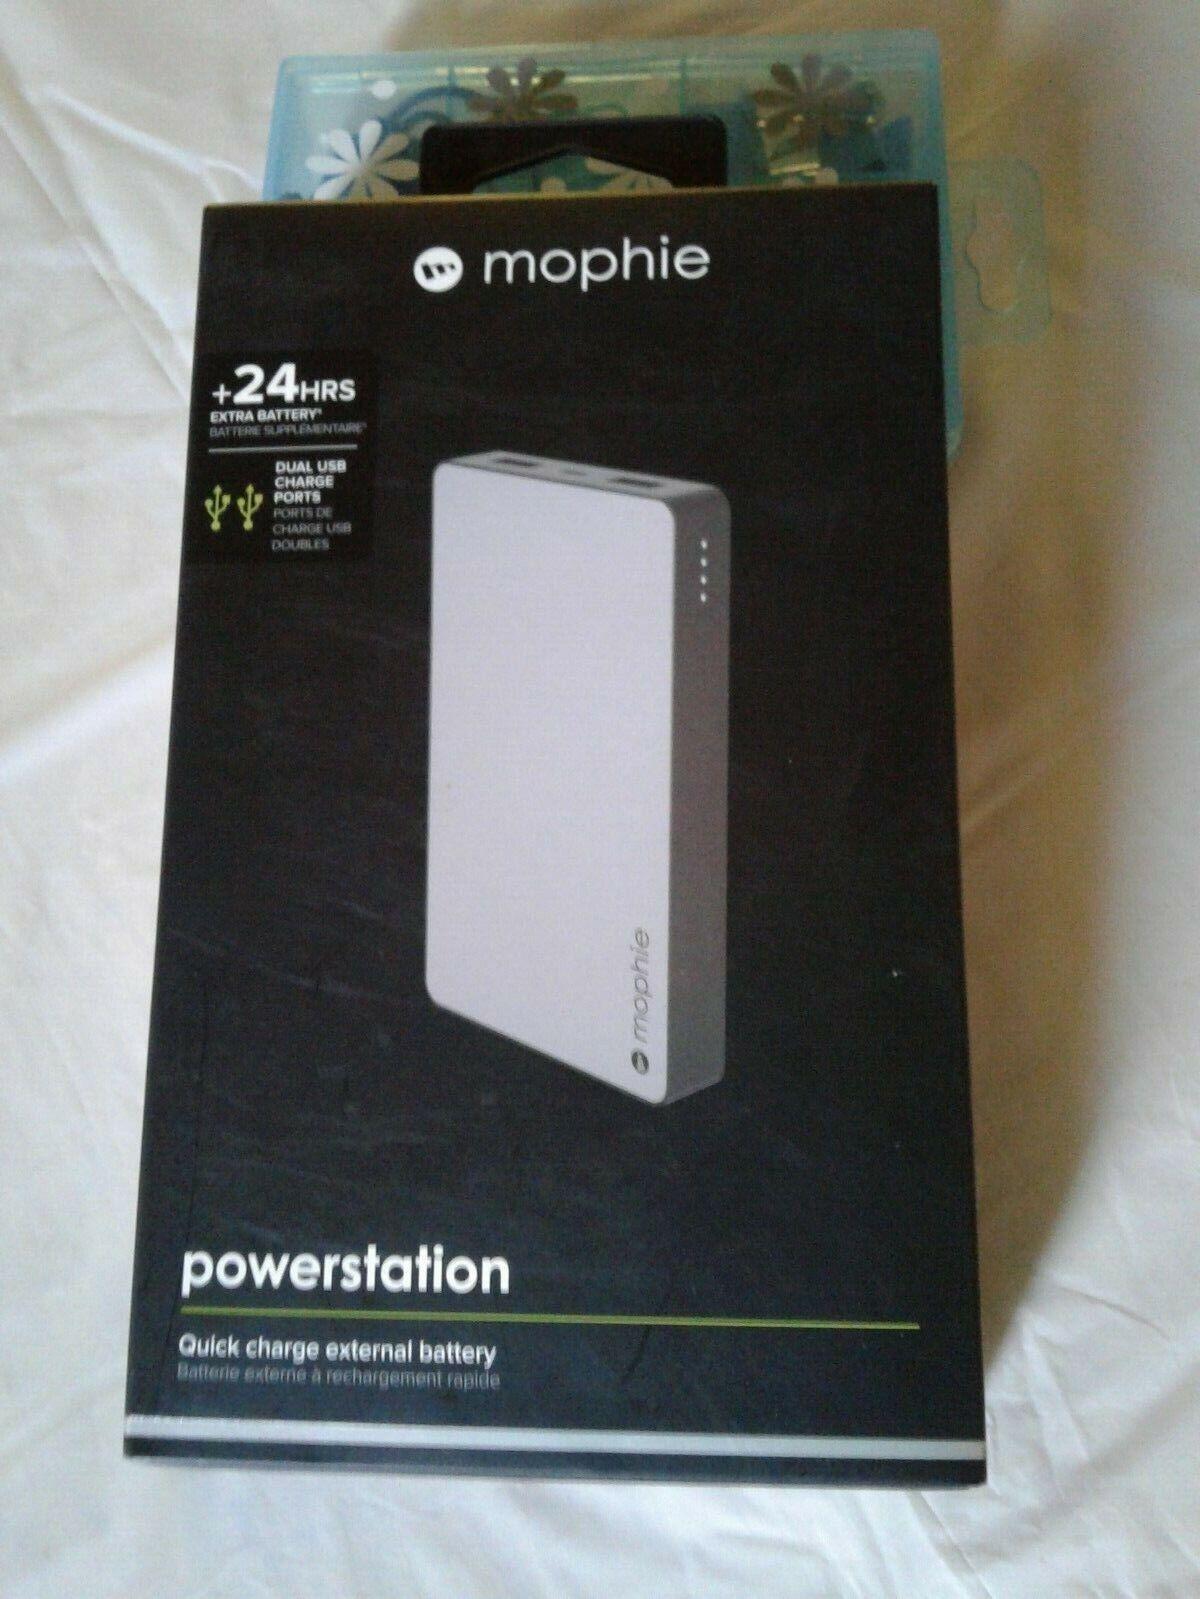 Mophie 6000 Mah external battery powerbank